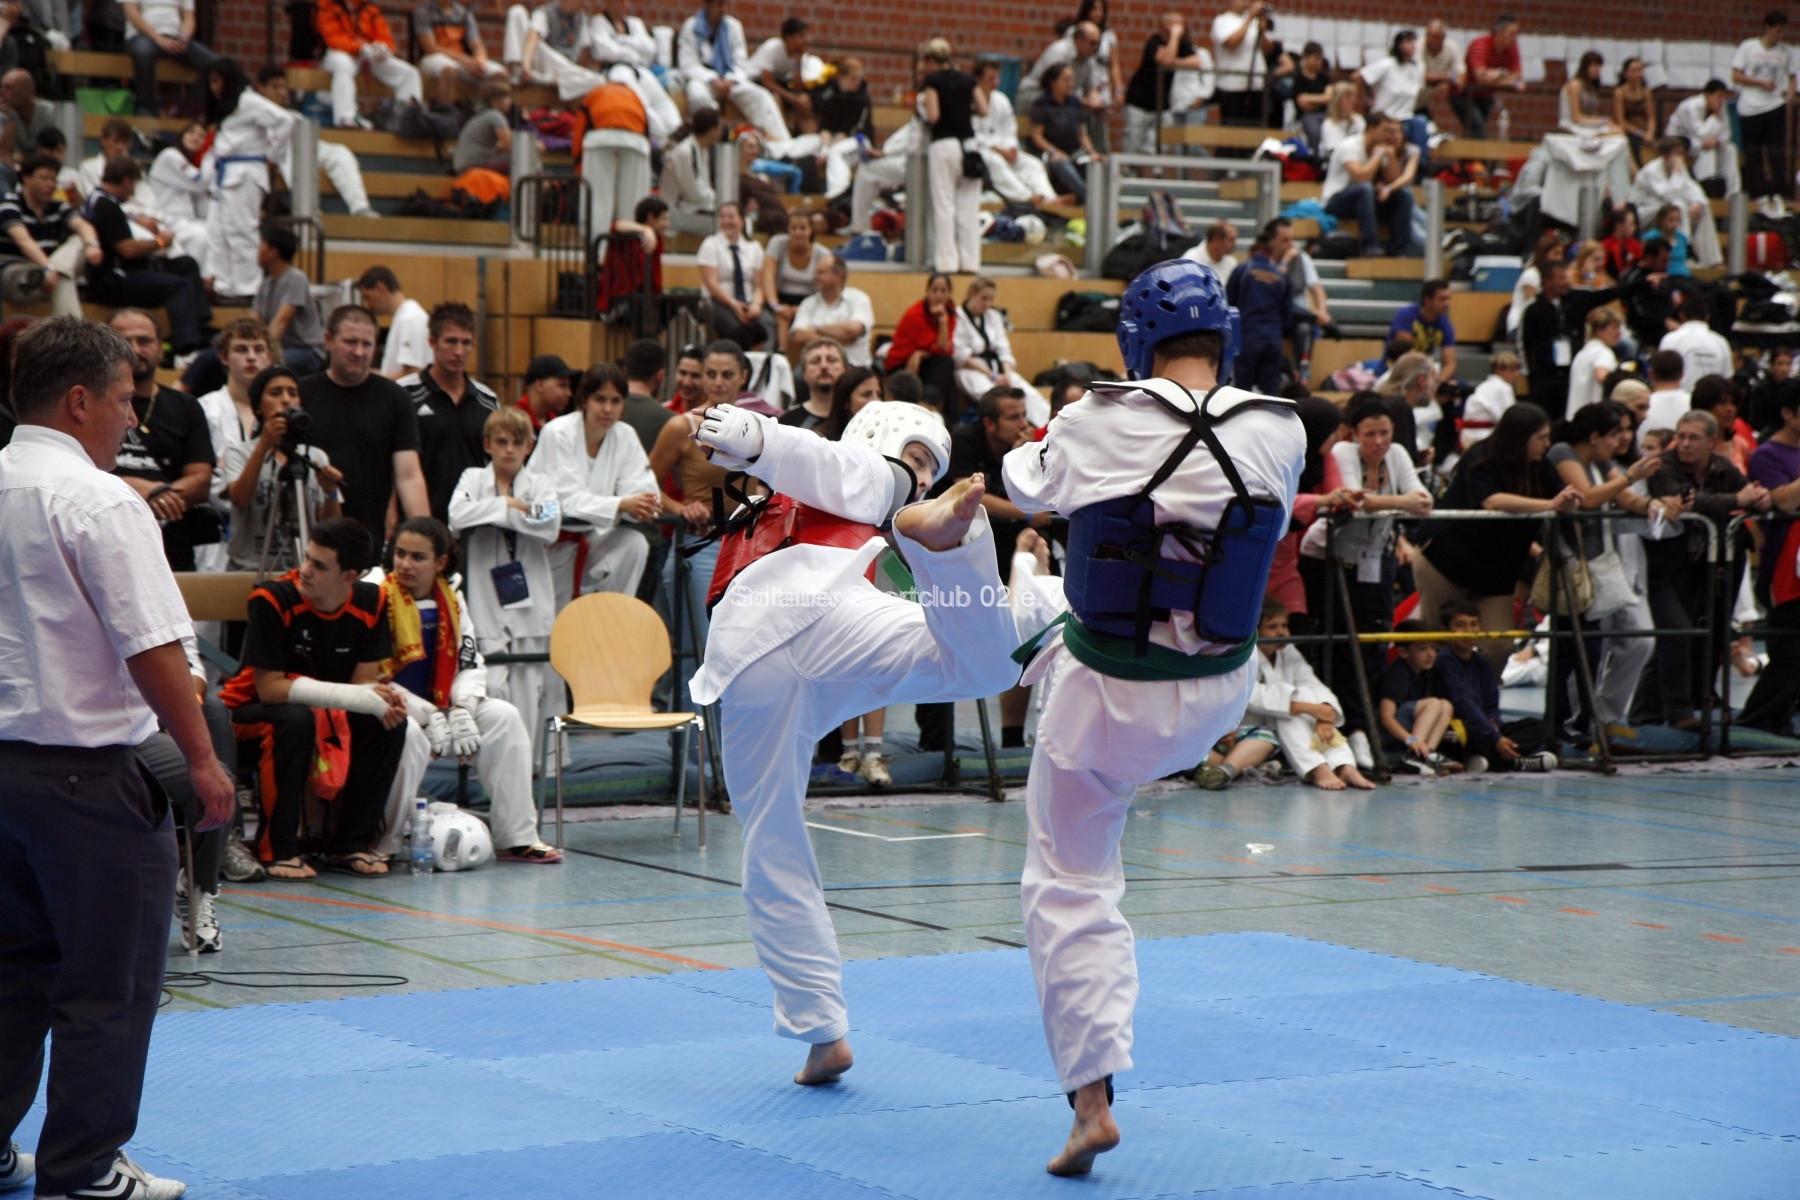 2011-06-25-bavaria-open-0022